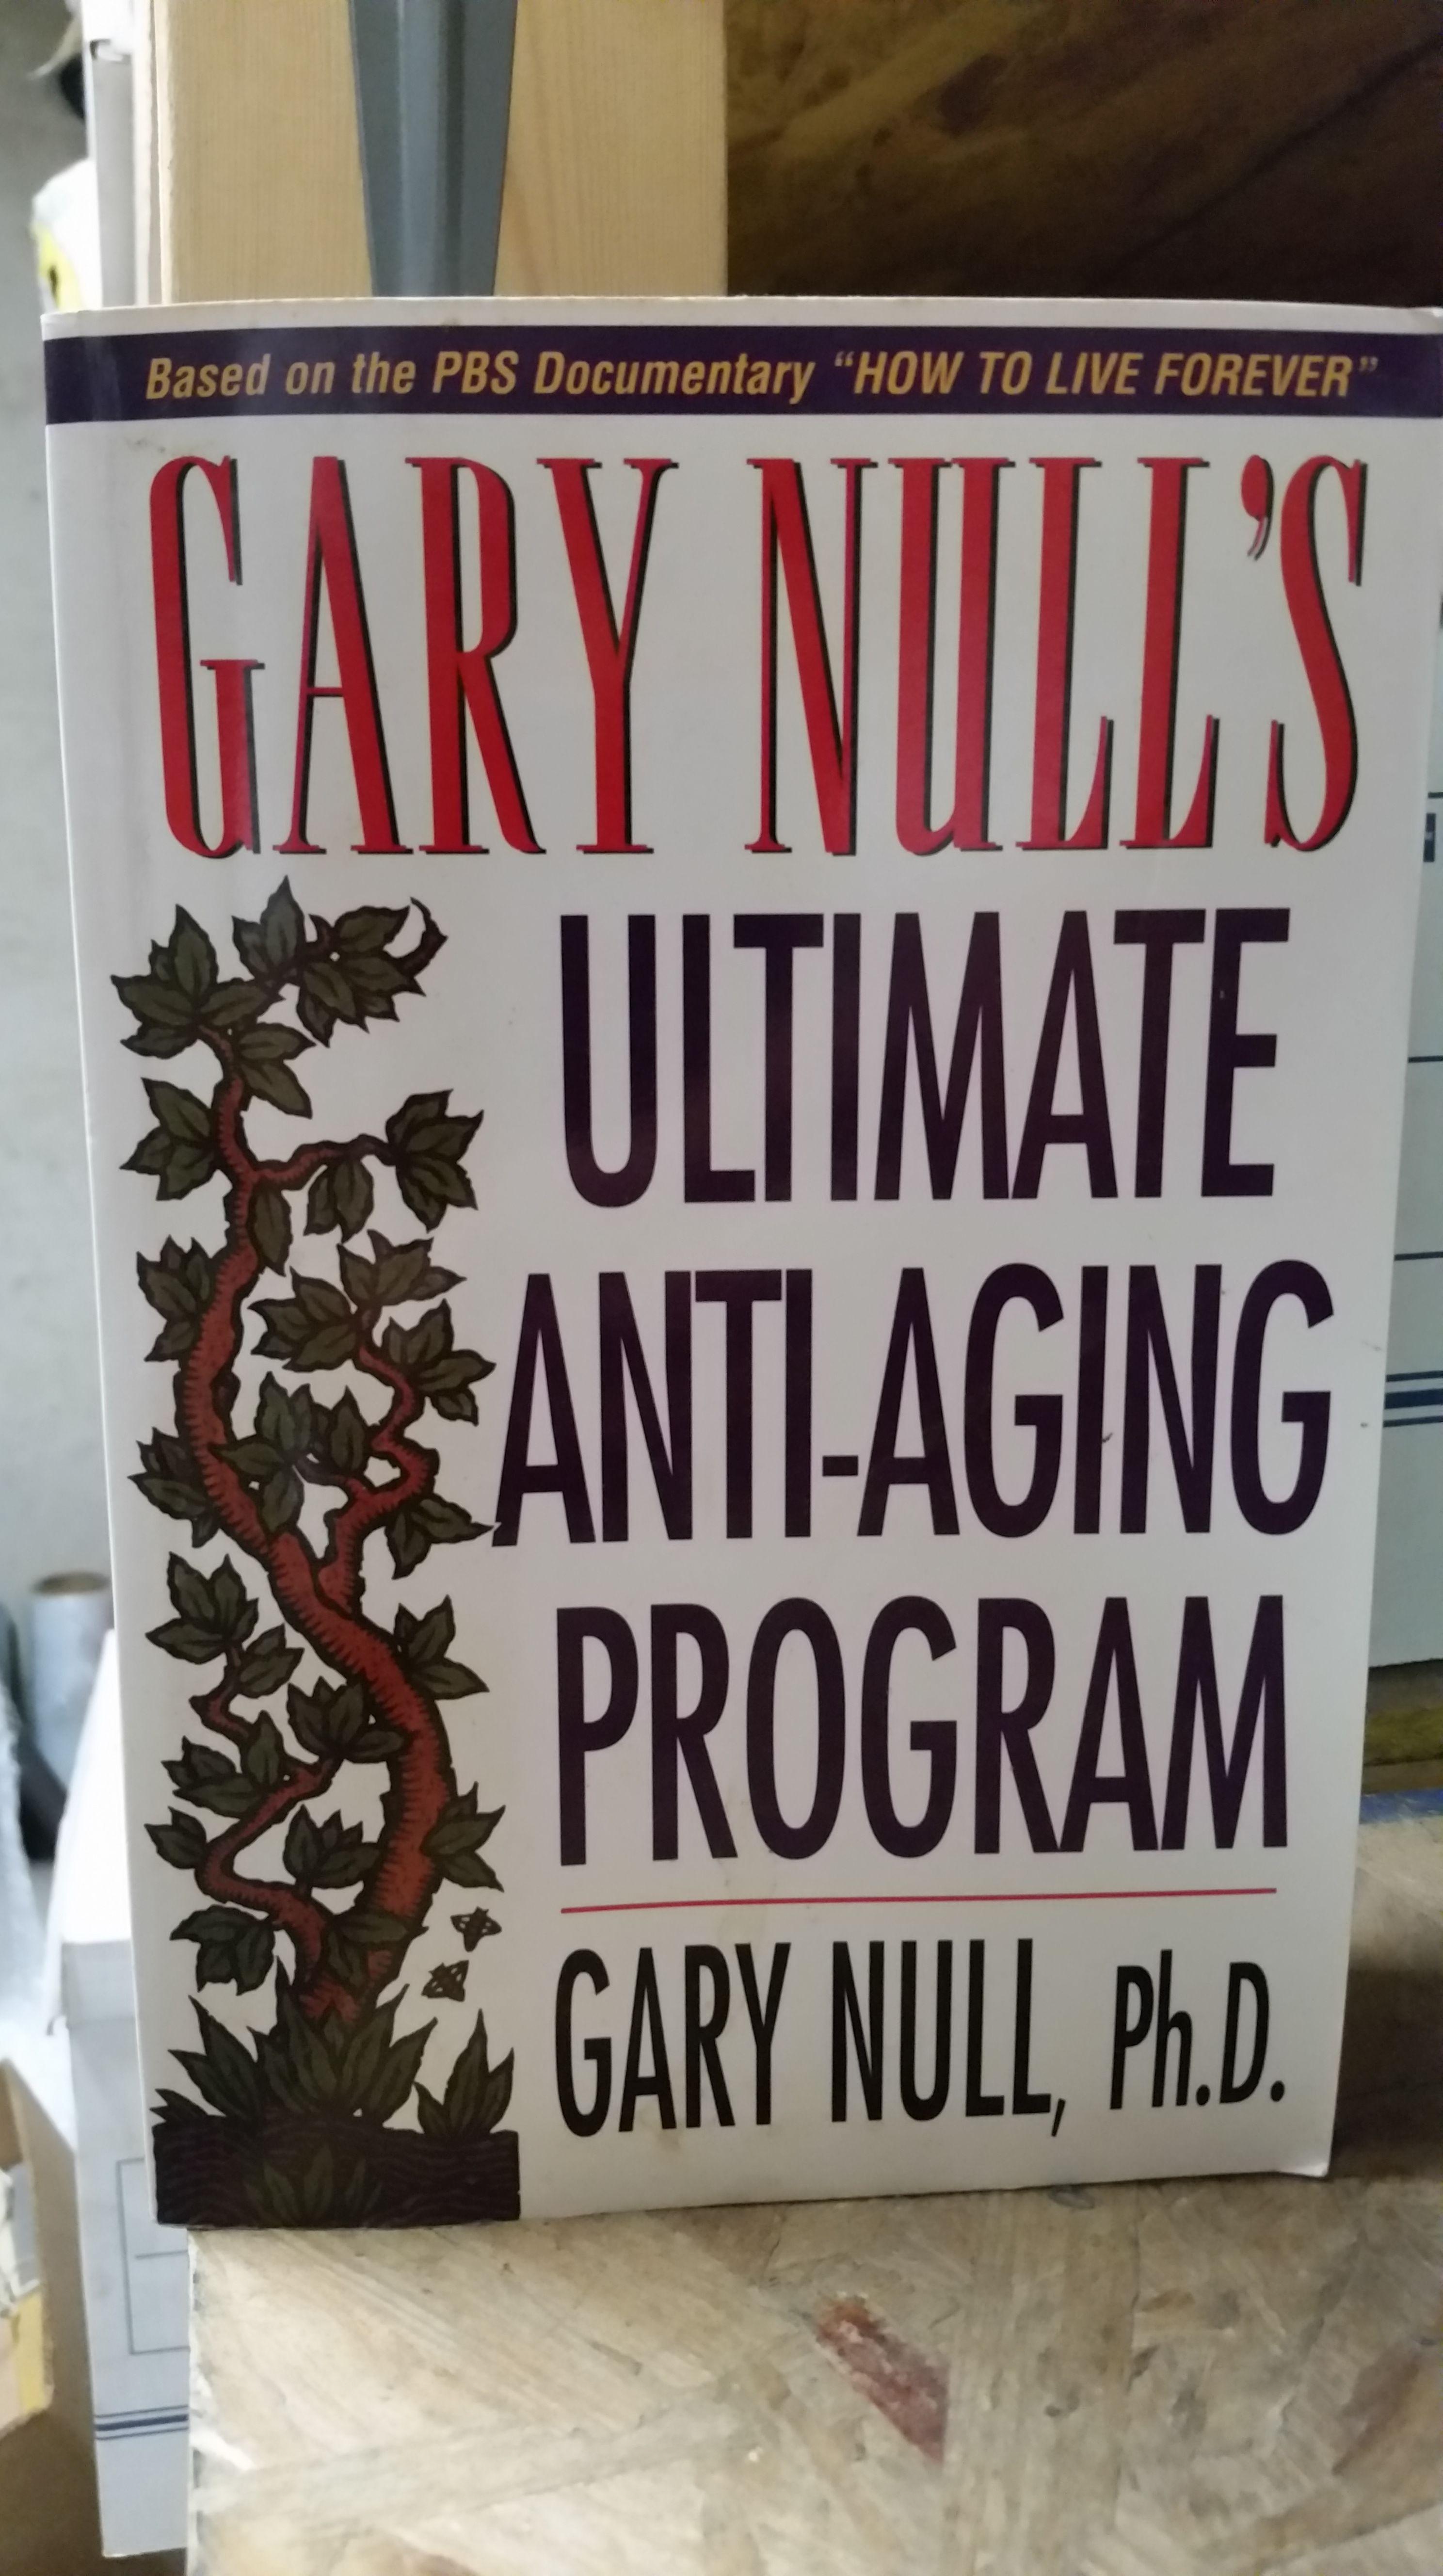 Gary Nulls Ultimate Anti-Aging Program